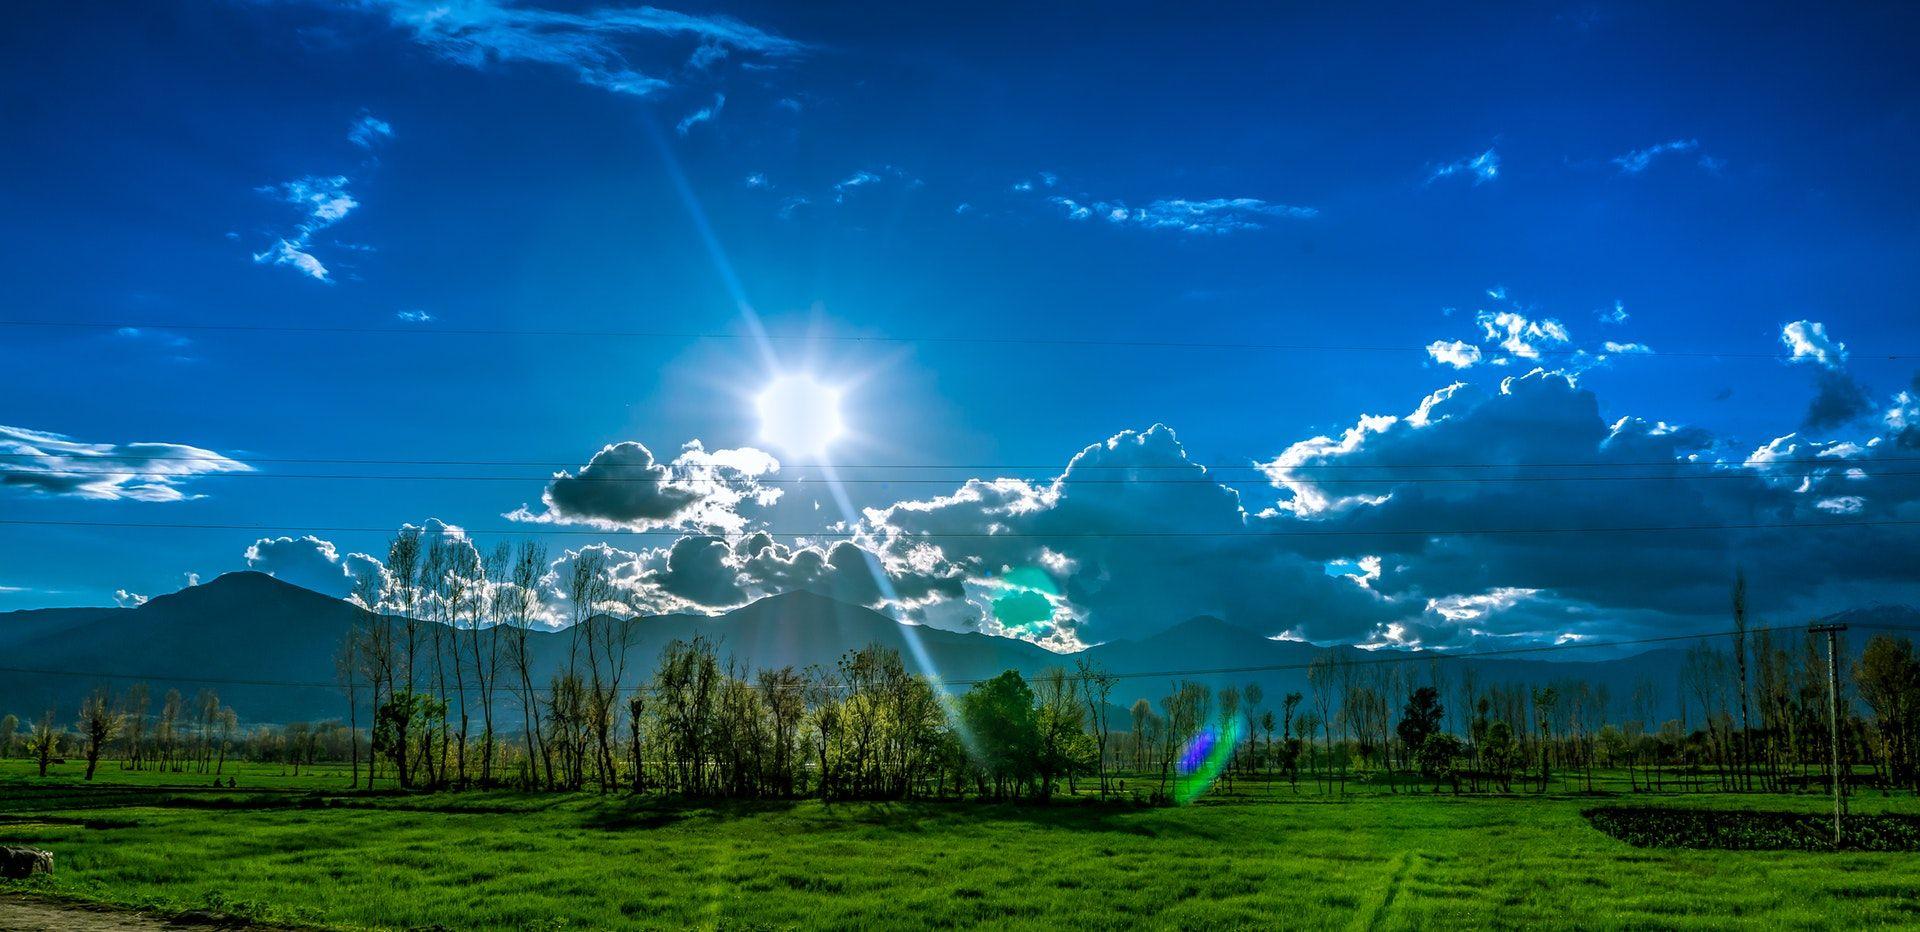 عکس زمینه آسمان نیمه ابری و دشت سر سبز پس زمینه